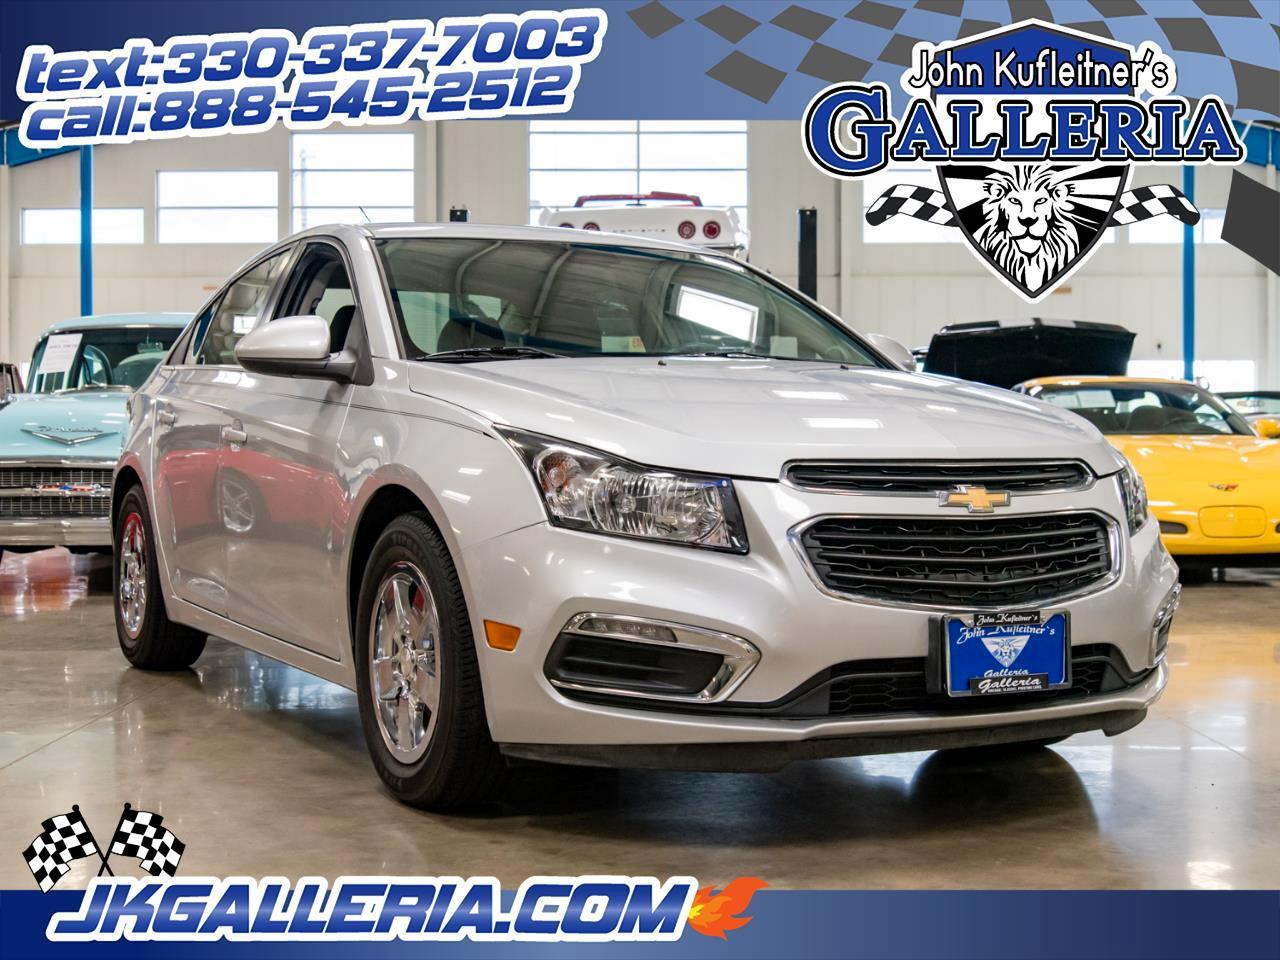 2015 Chevrolet Cruze 4dr Sdn Auto 1LT